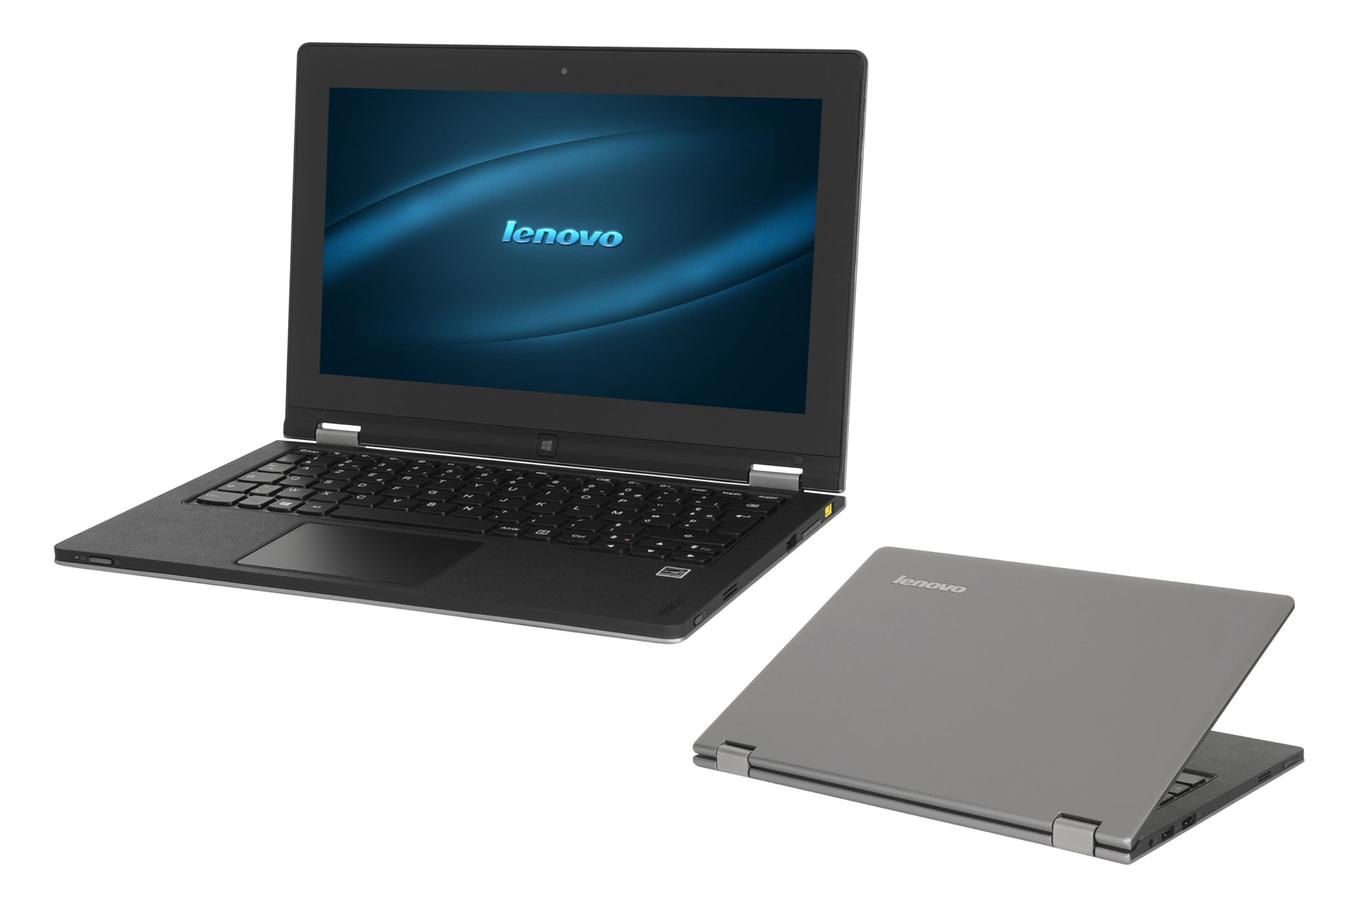 yoga11 t30_PC Hybride / PC 2 en 1 Lenovo IdeaPad Yoga 11 - MAS24FR - YOGA11 (3661806) | Darty